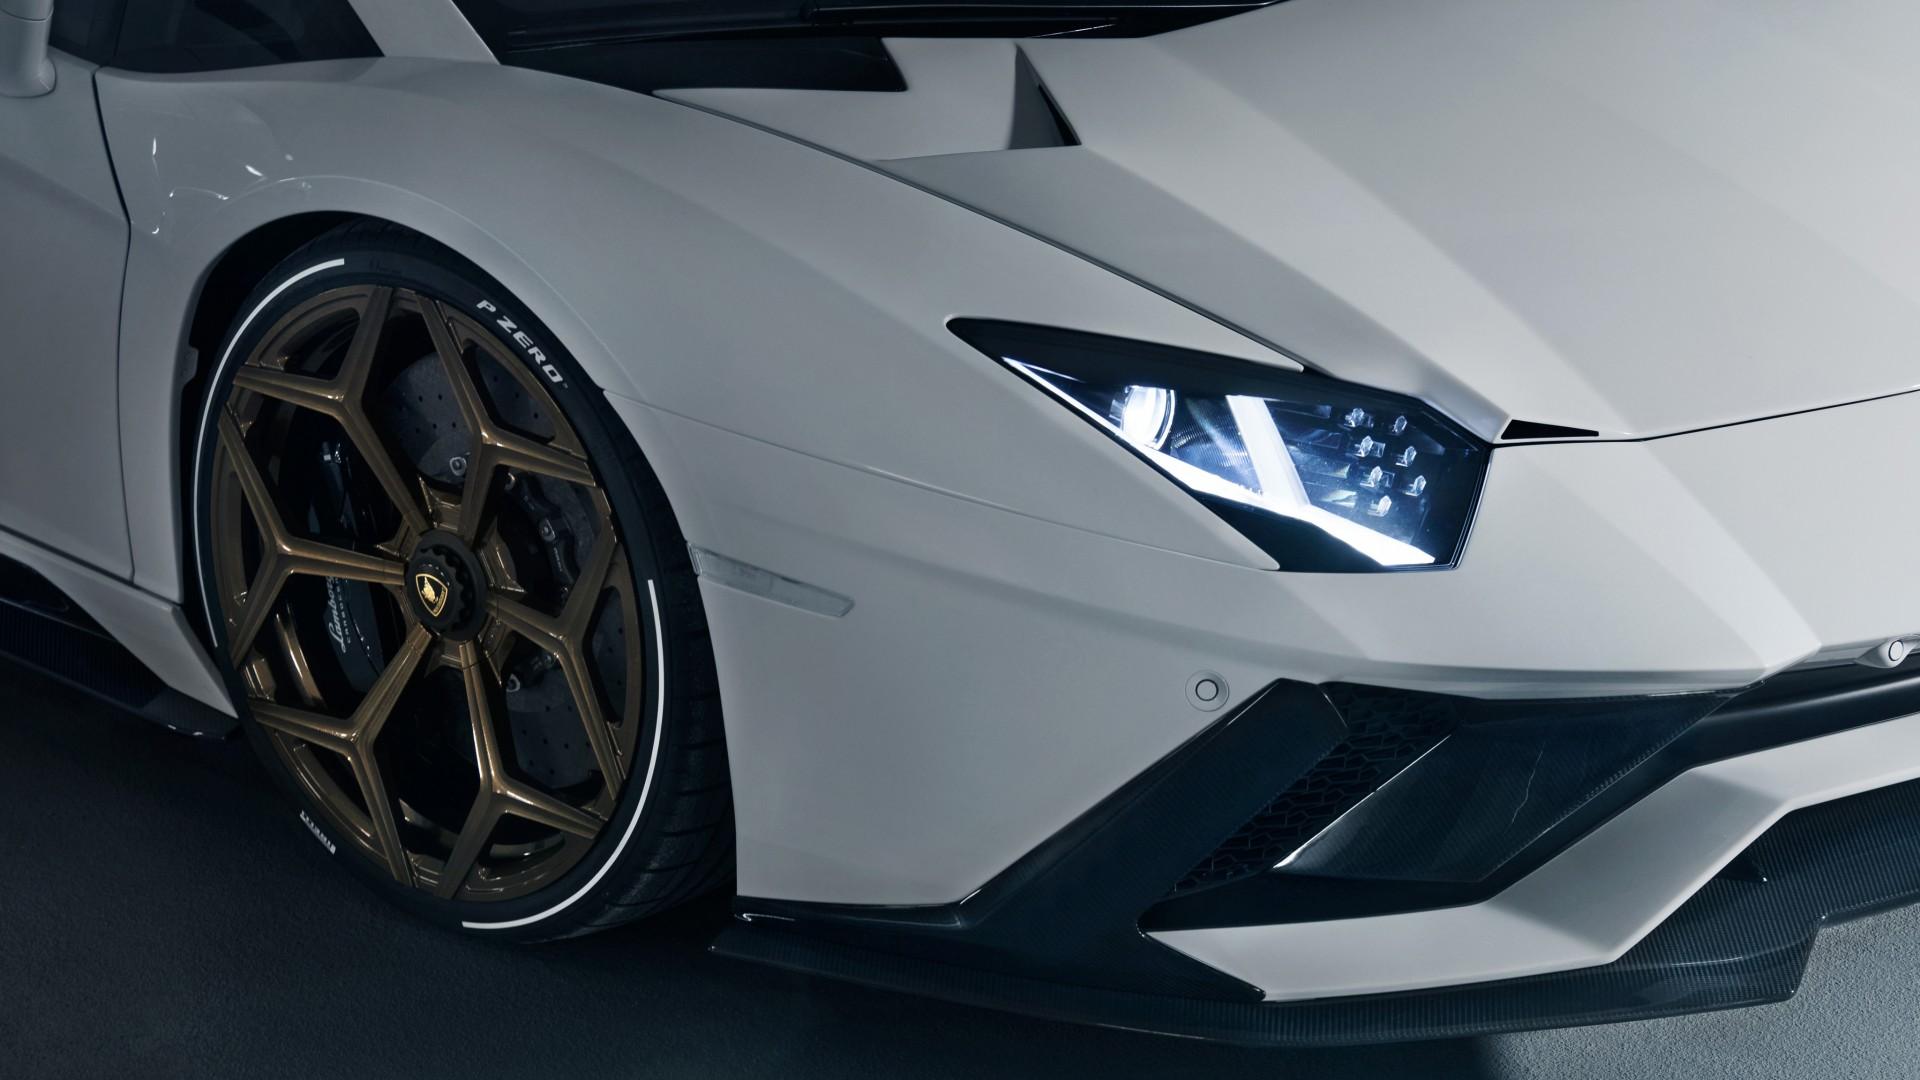 Lamborghini Aventador S Roadster Hd 4k Wallpaper: 2018 Novitec Torado Lamborghini Aventador S 4K 3 Wallpaper